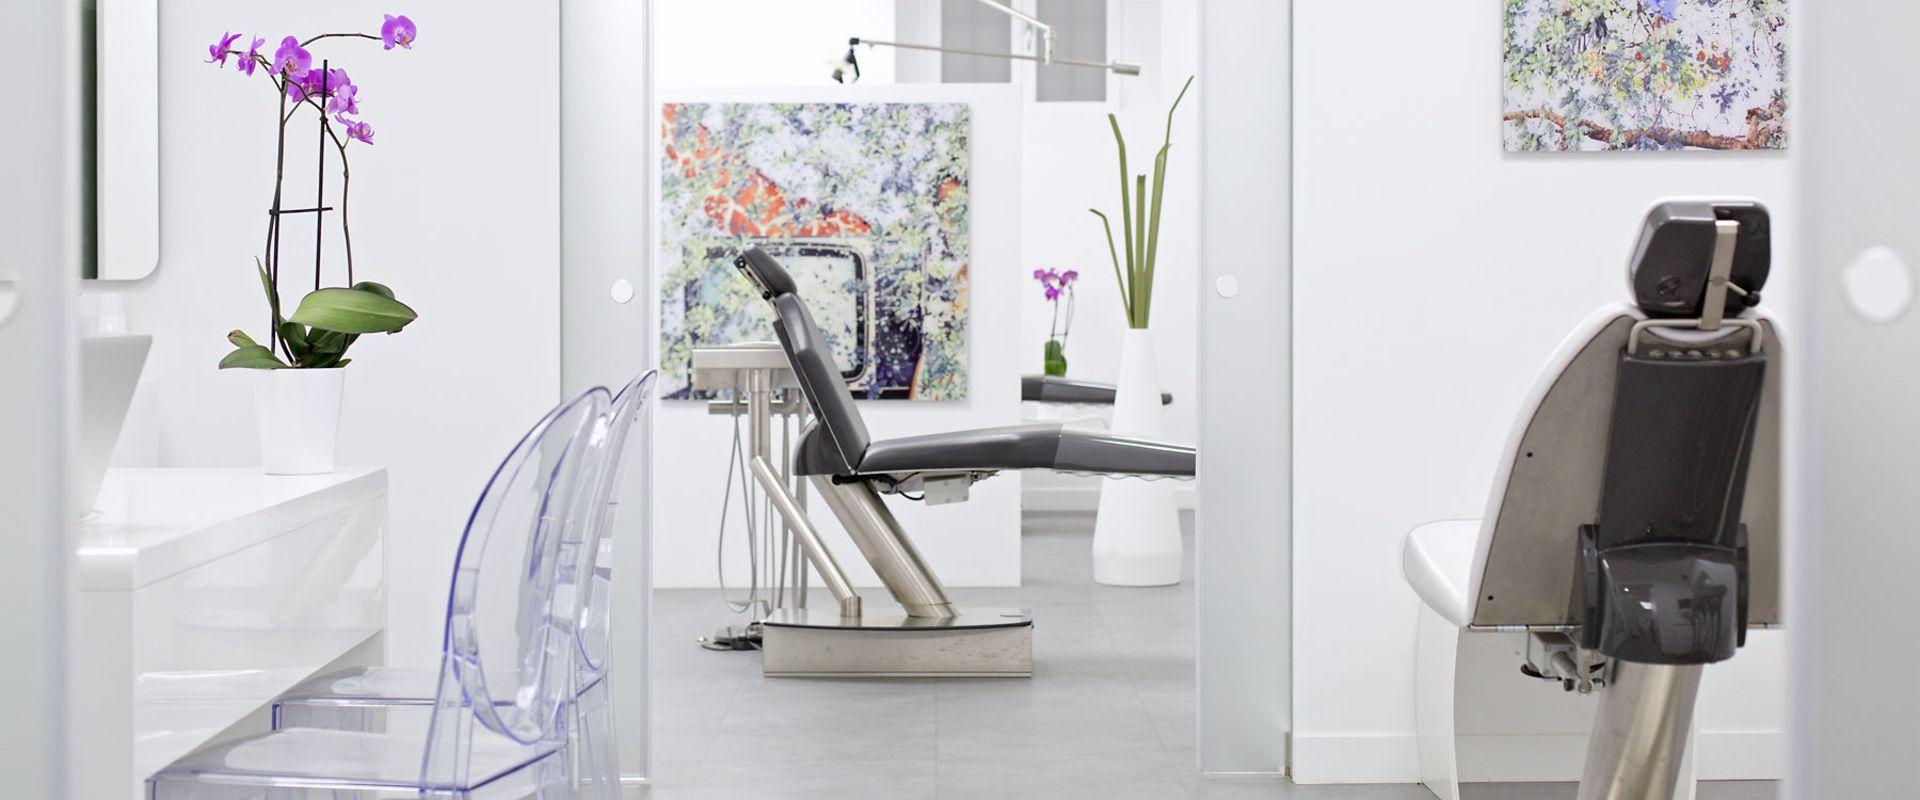 orthodontie paris cabinet d 39 orthodontie paris. Black Bedroom Furniture Sets. Home Design Ideas